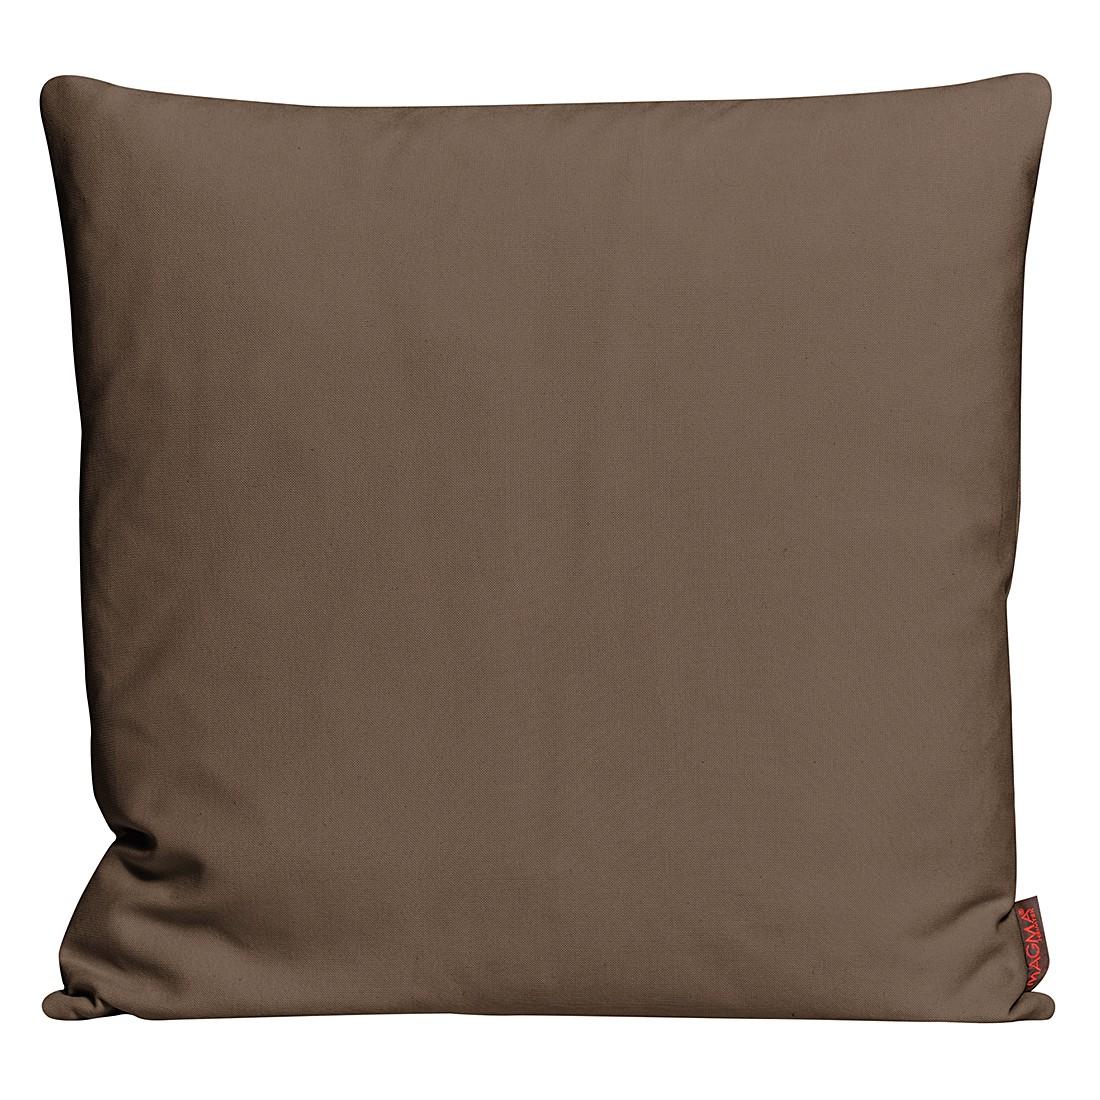 Kissenhülle Paso – Braun – Maße: 40 x 40 cm, Magma-Heimtex jetzt kaufen